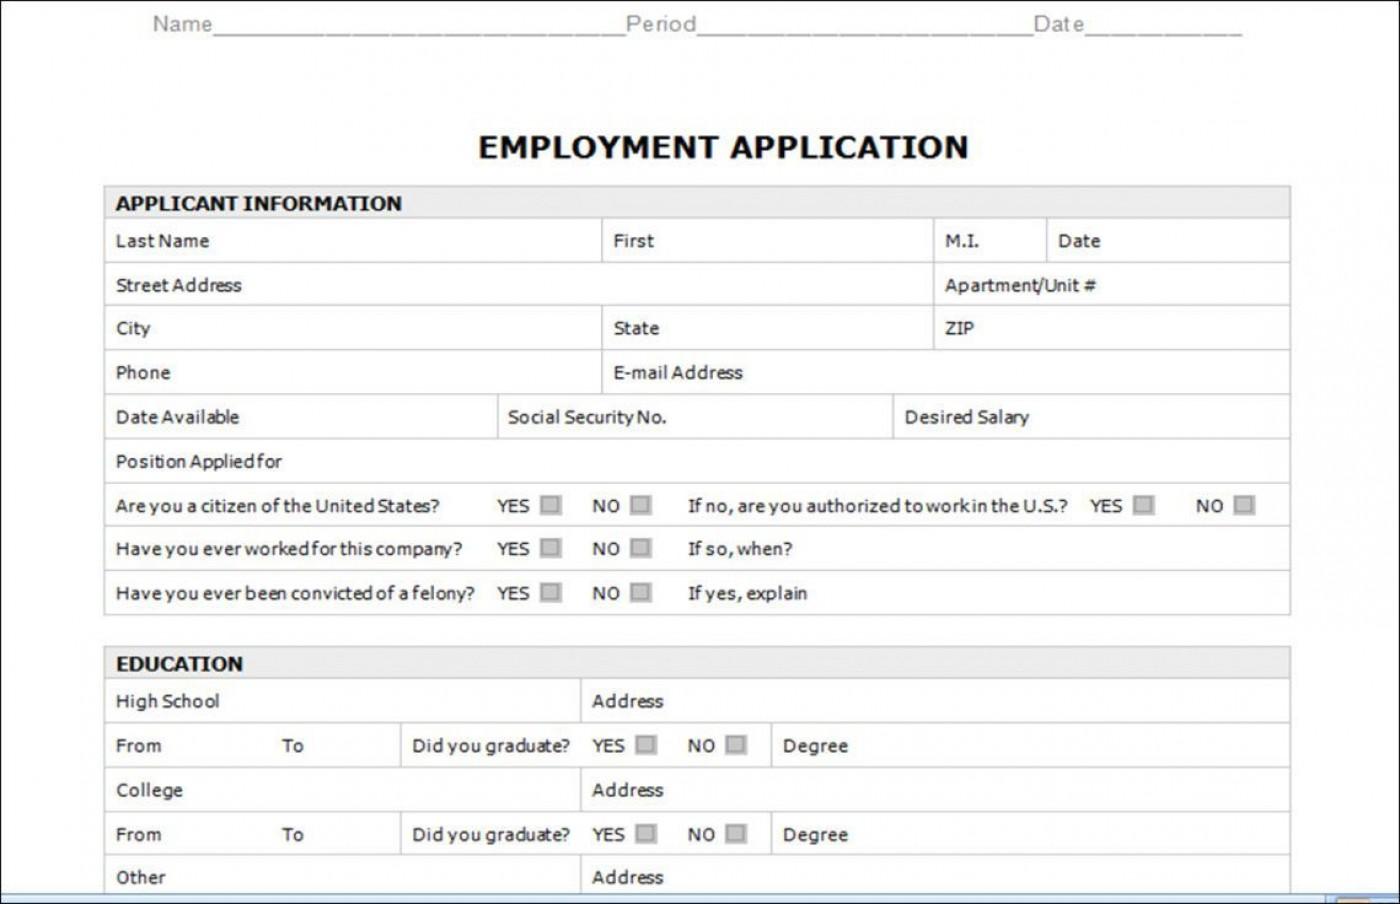 003 Astounding Employment Application Form Template M Word Photo  Job Microsoft Description1400